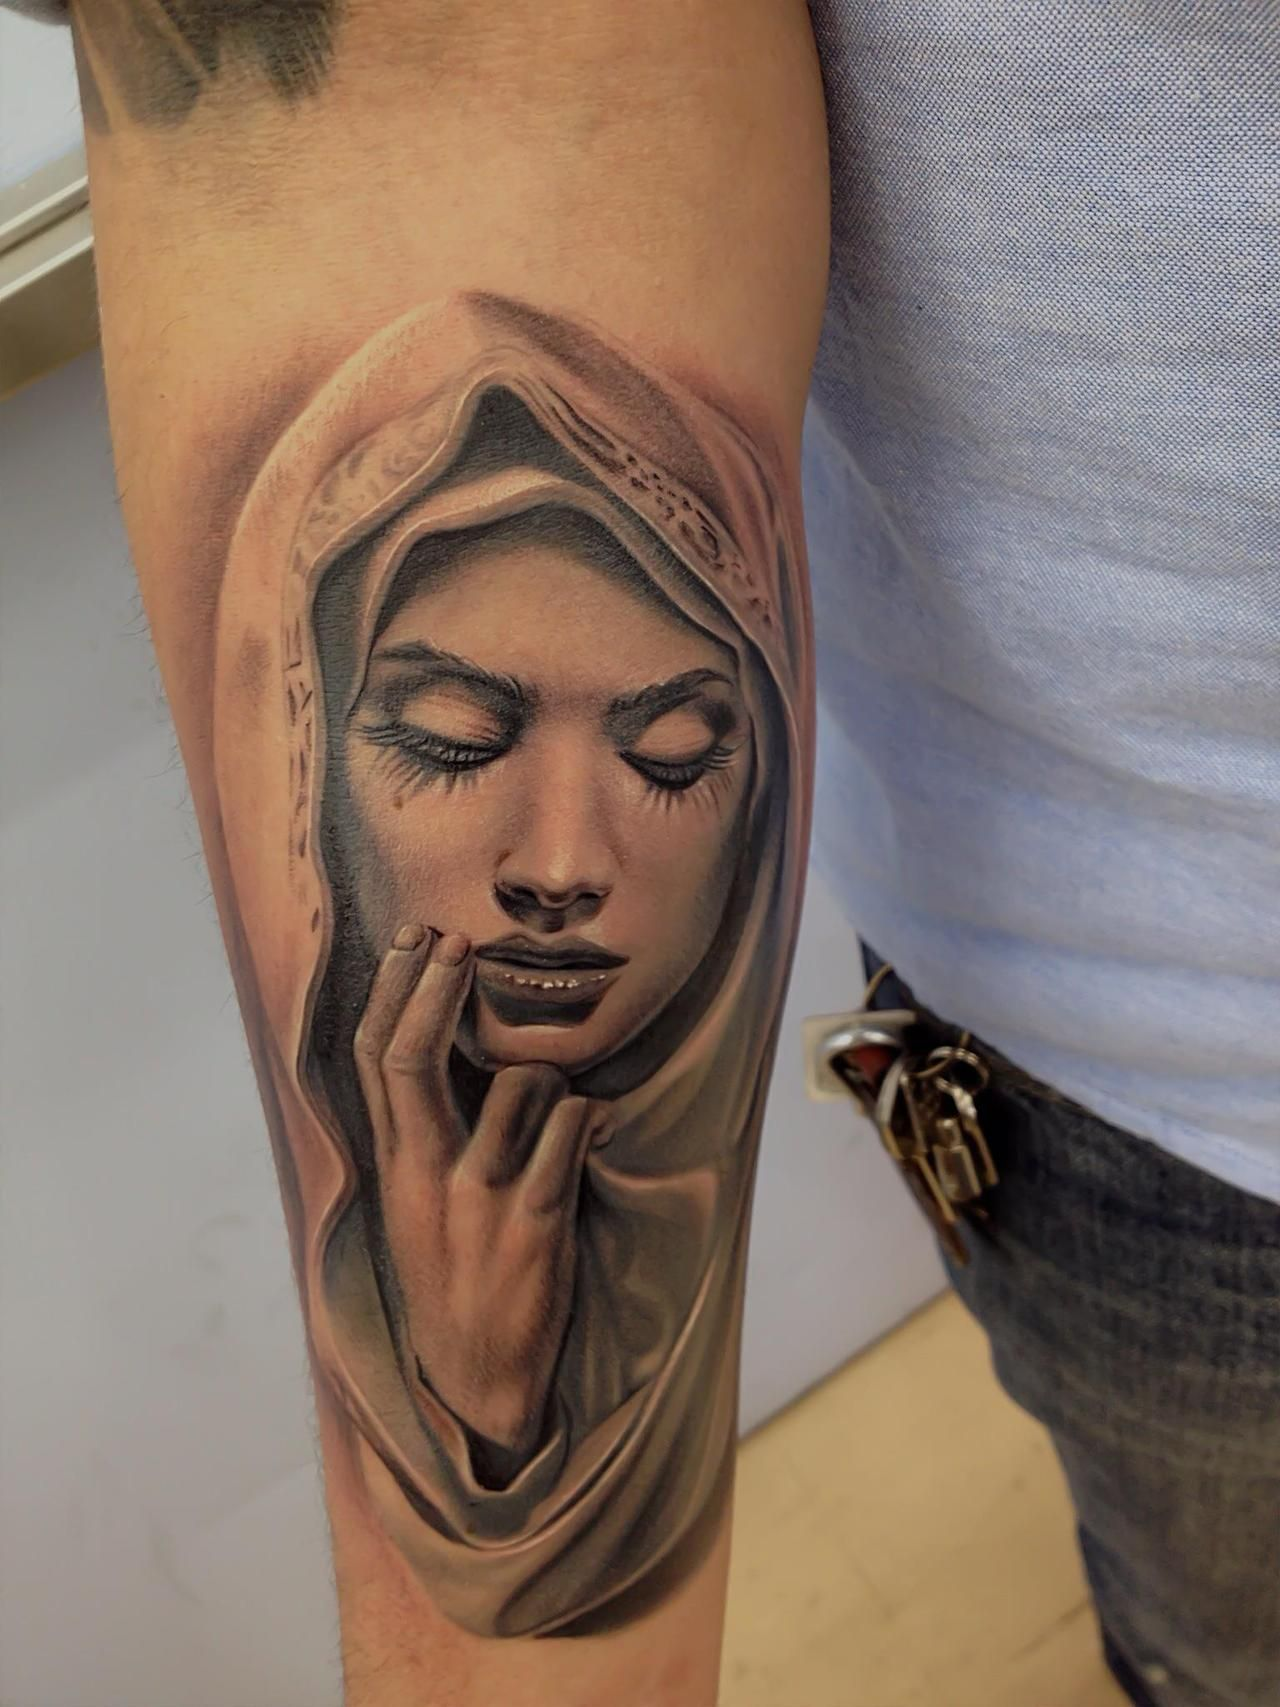 Done By Rember At Cat Tattoo In Addison Tx More Tatuajes Religiosos Tatuaje Virgen Y Tatuajes Cristianos